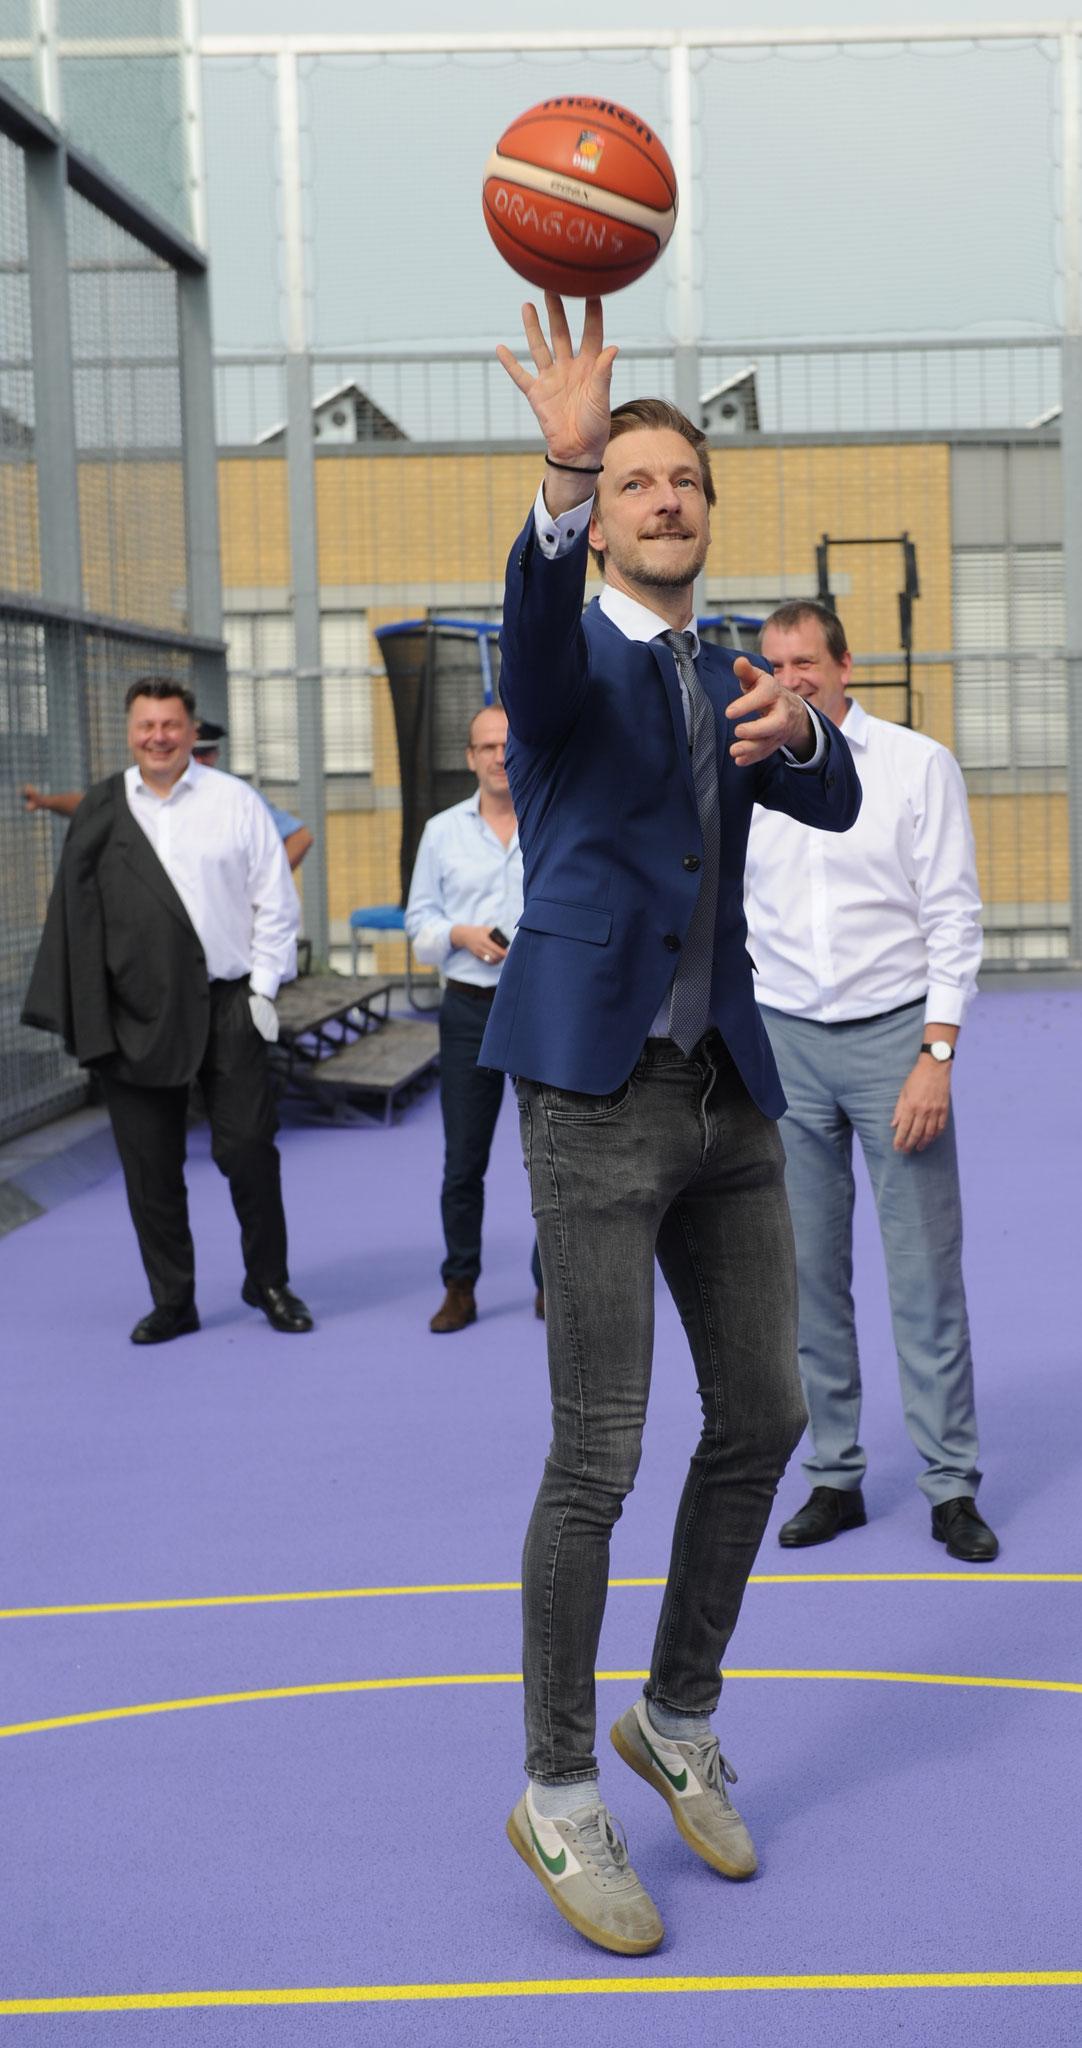 ... Sportstadtrat Gordon Lemm hatte auch drei Versuche. © pressefoto-uhlemann.de